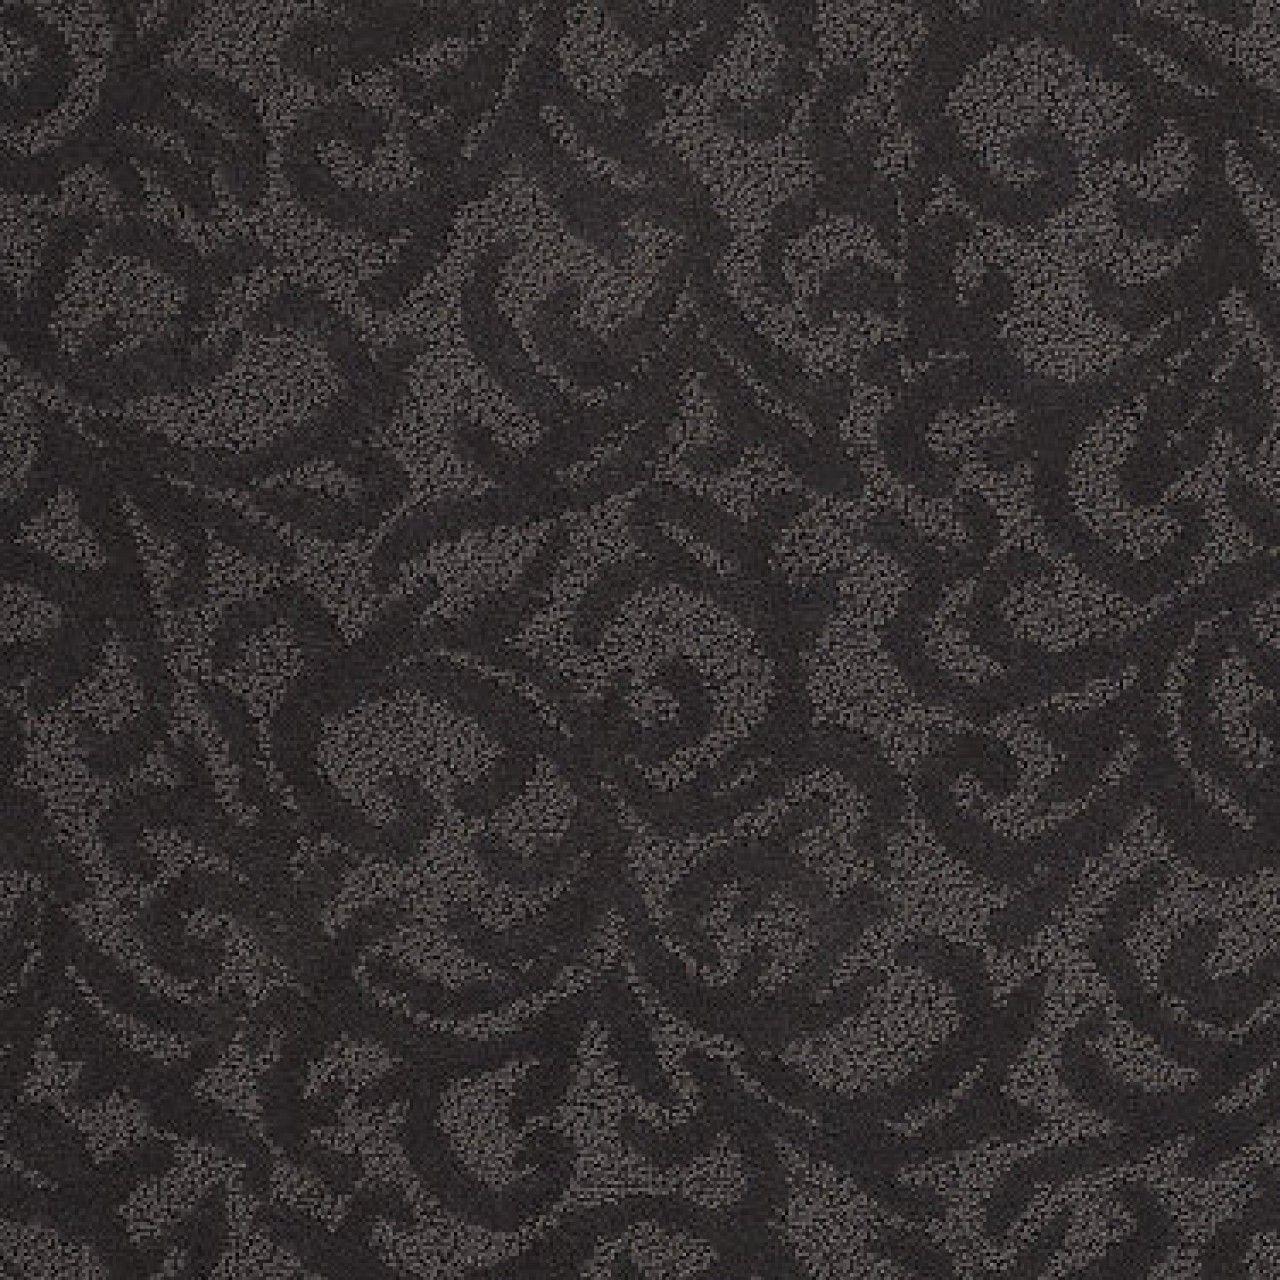 Cherished Moment II - Shaw Tuftex Carpet